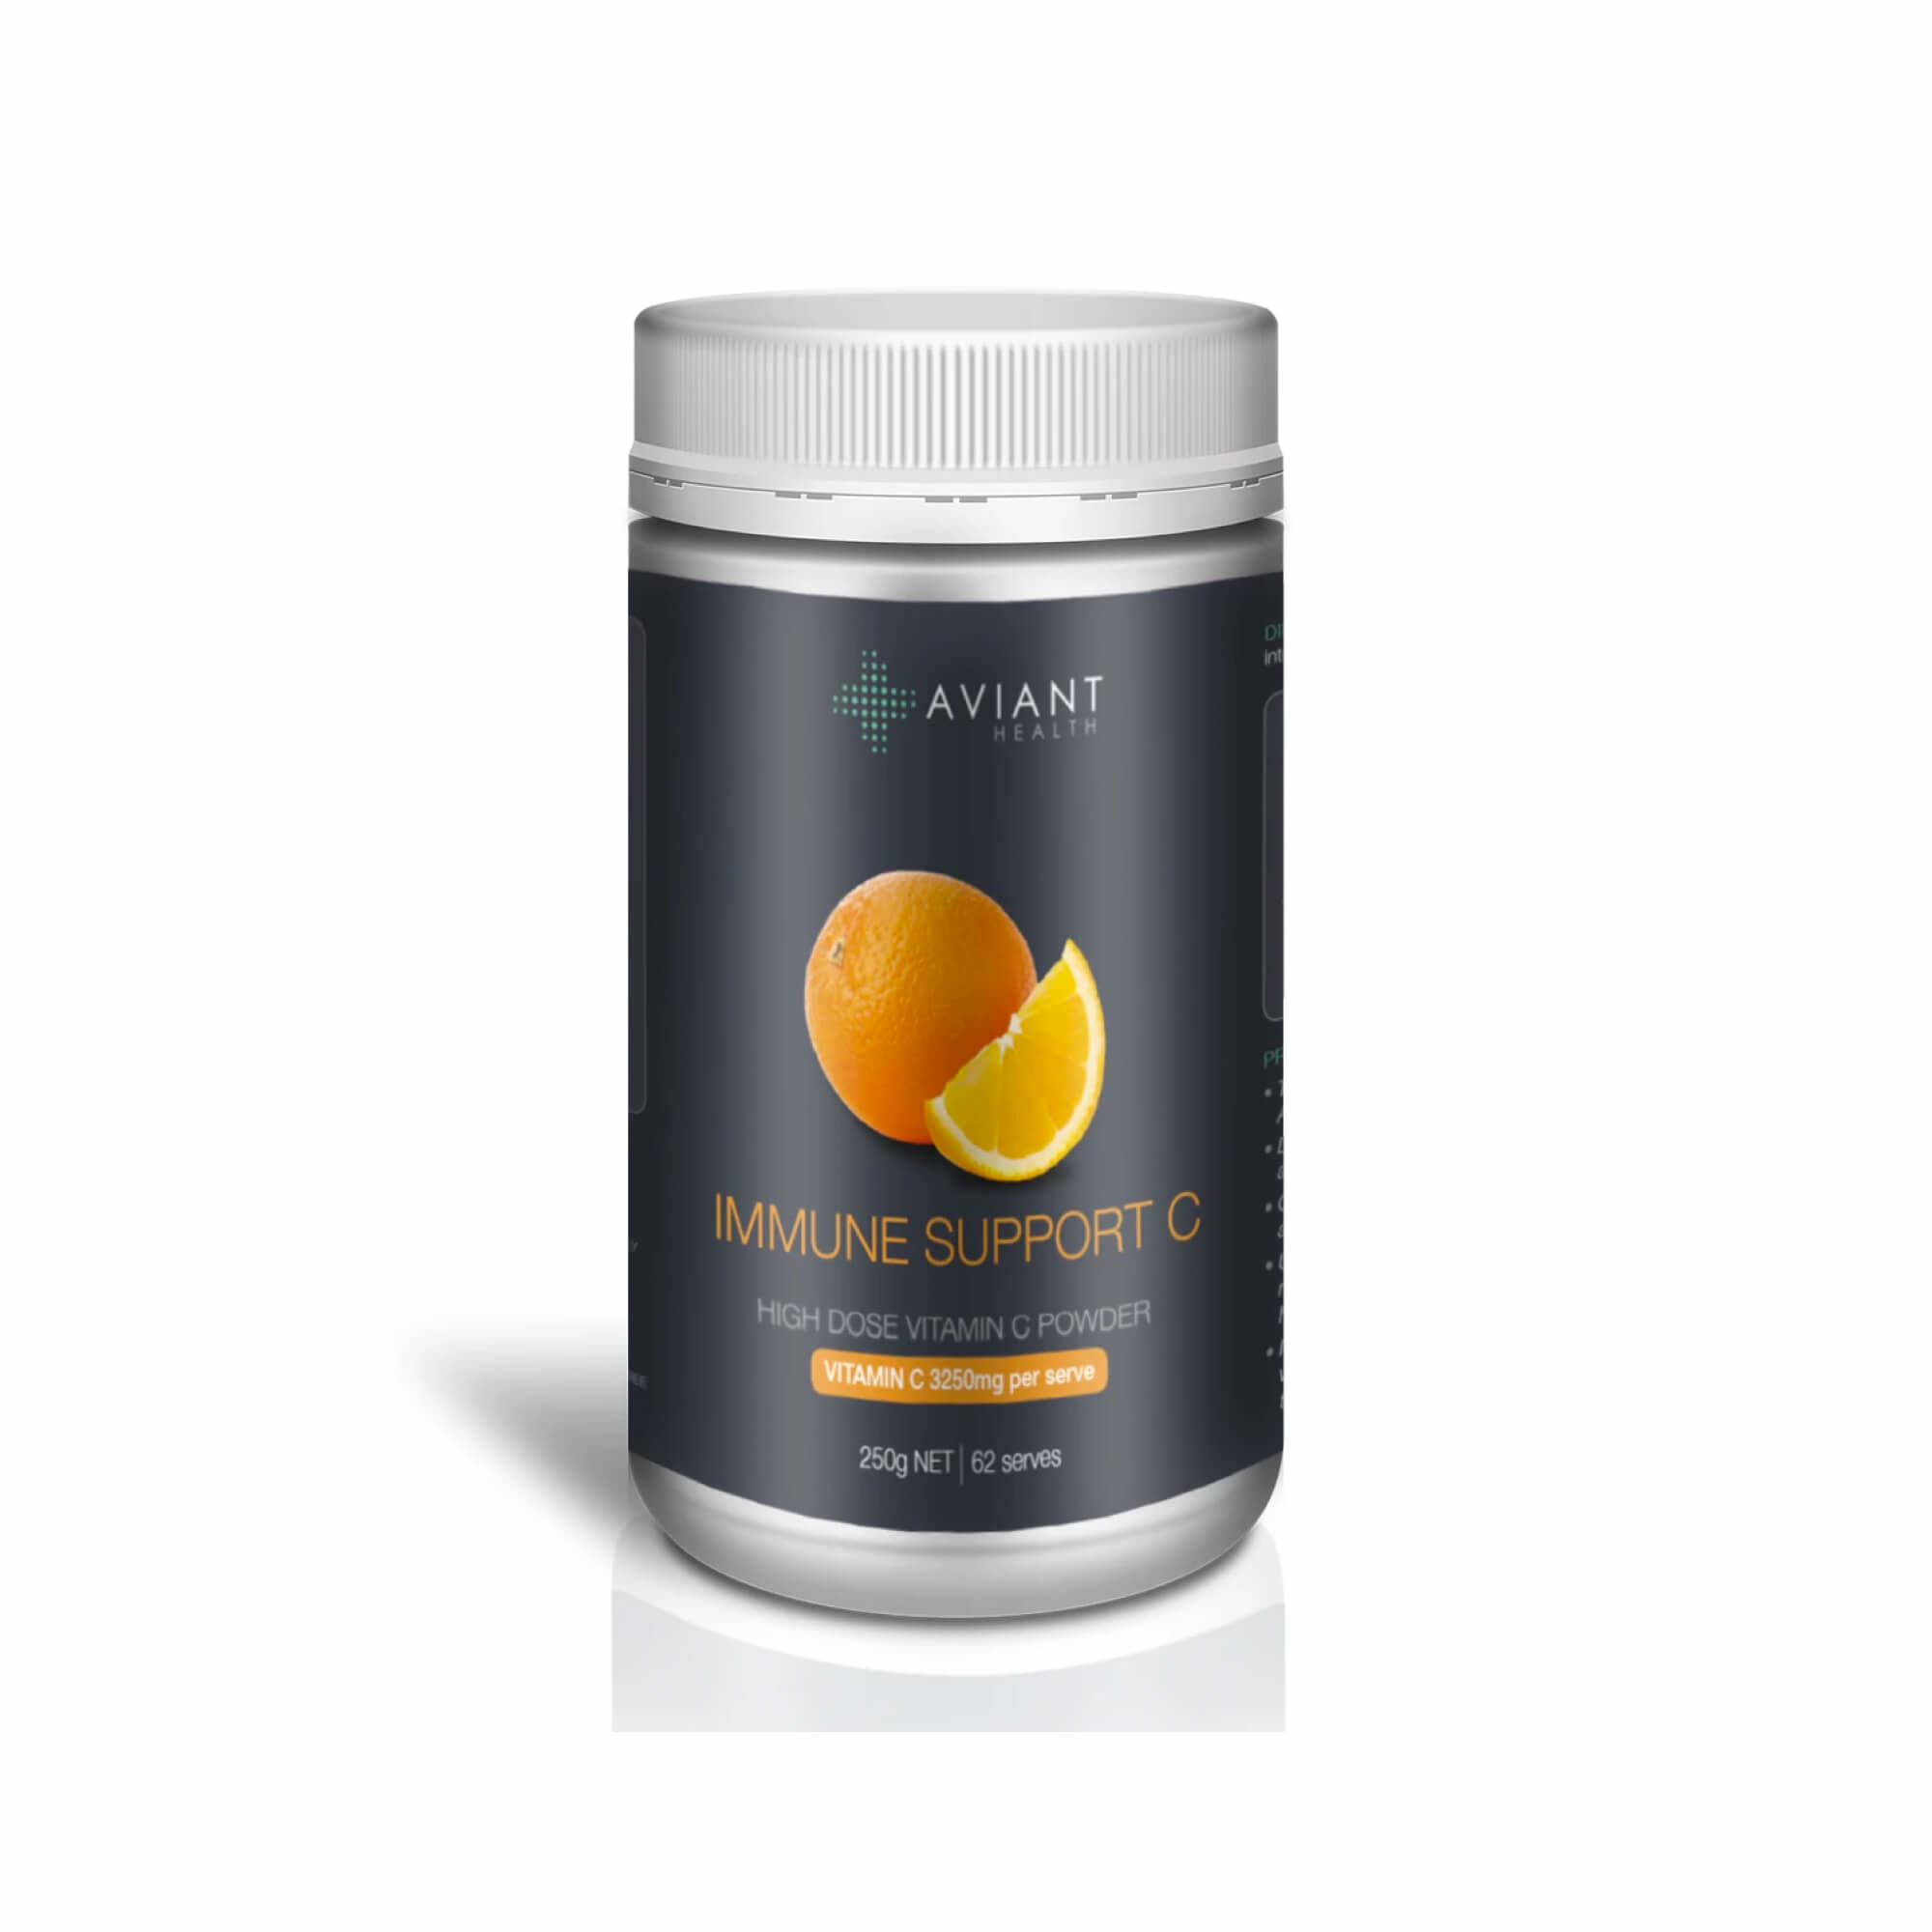 Aviant Immune Support C - High Dose Vitamin C Powder 250g-1